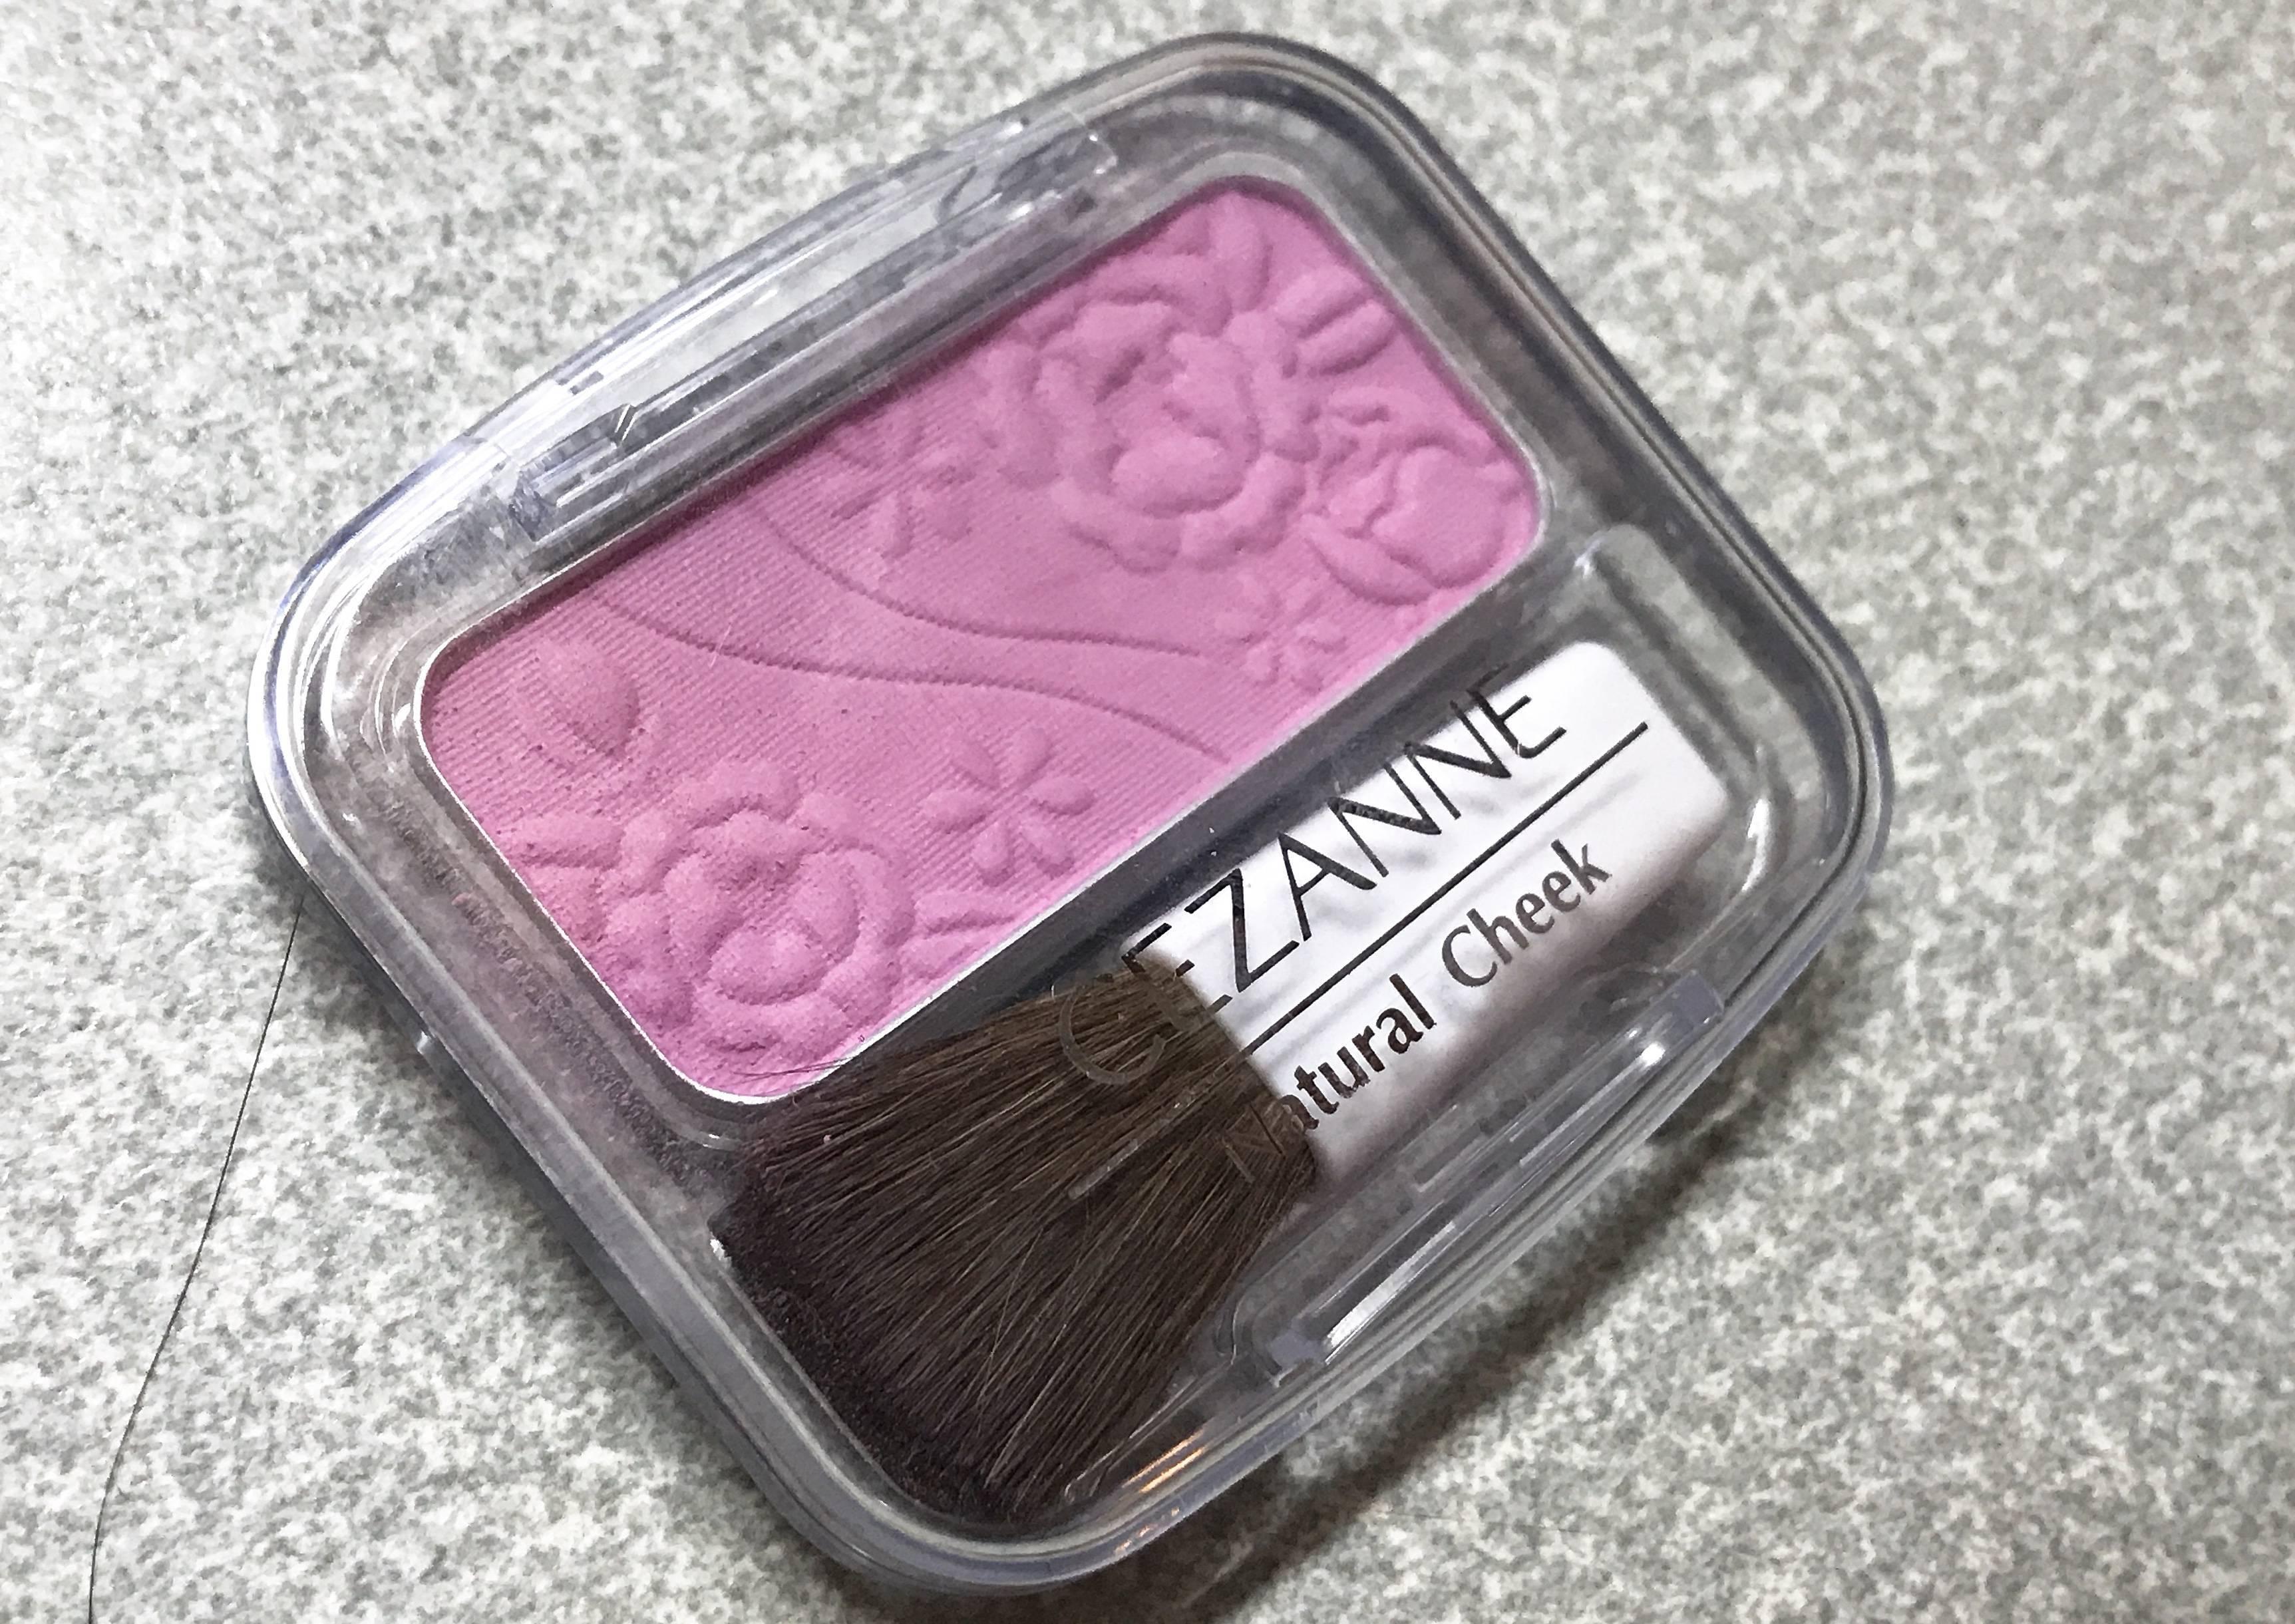 CEZANNEの〈紫チーク〉で春を先取り!〈美白&透明感〉を手に入れよう!_1_1